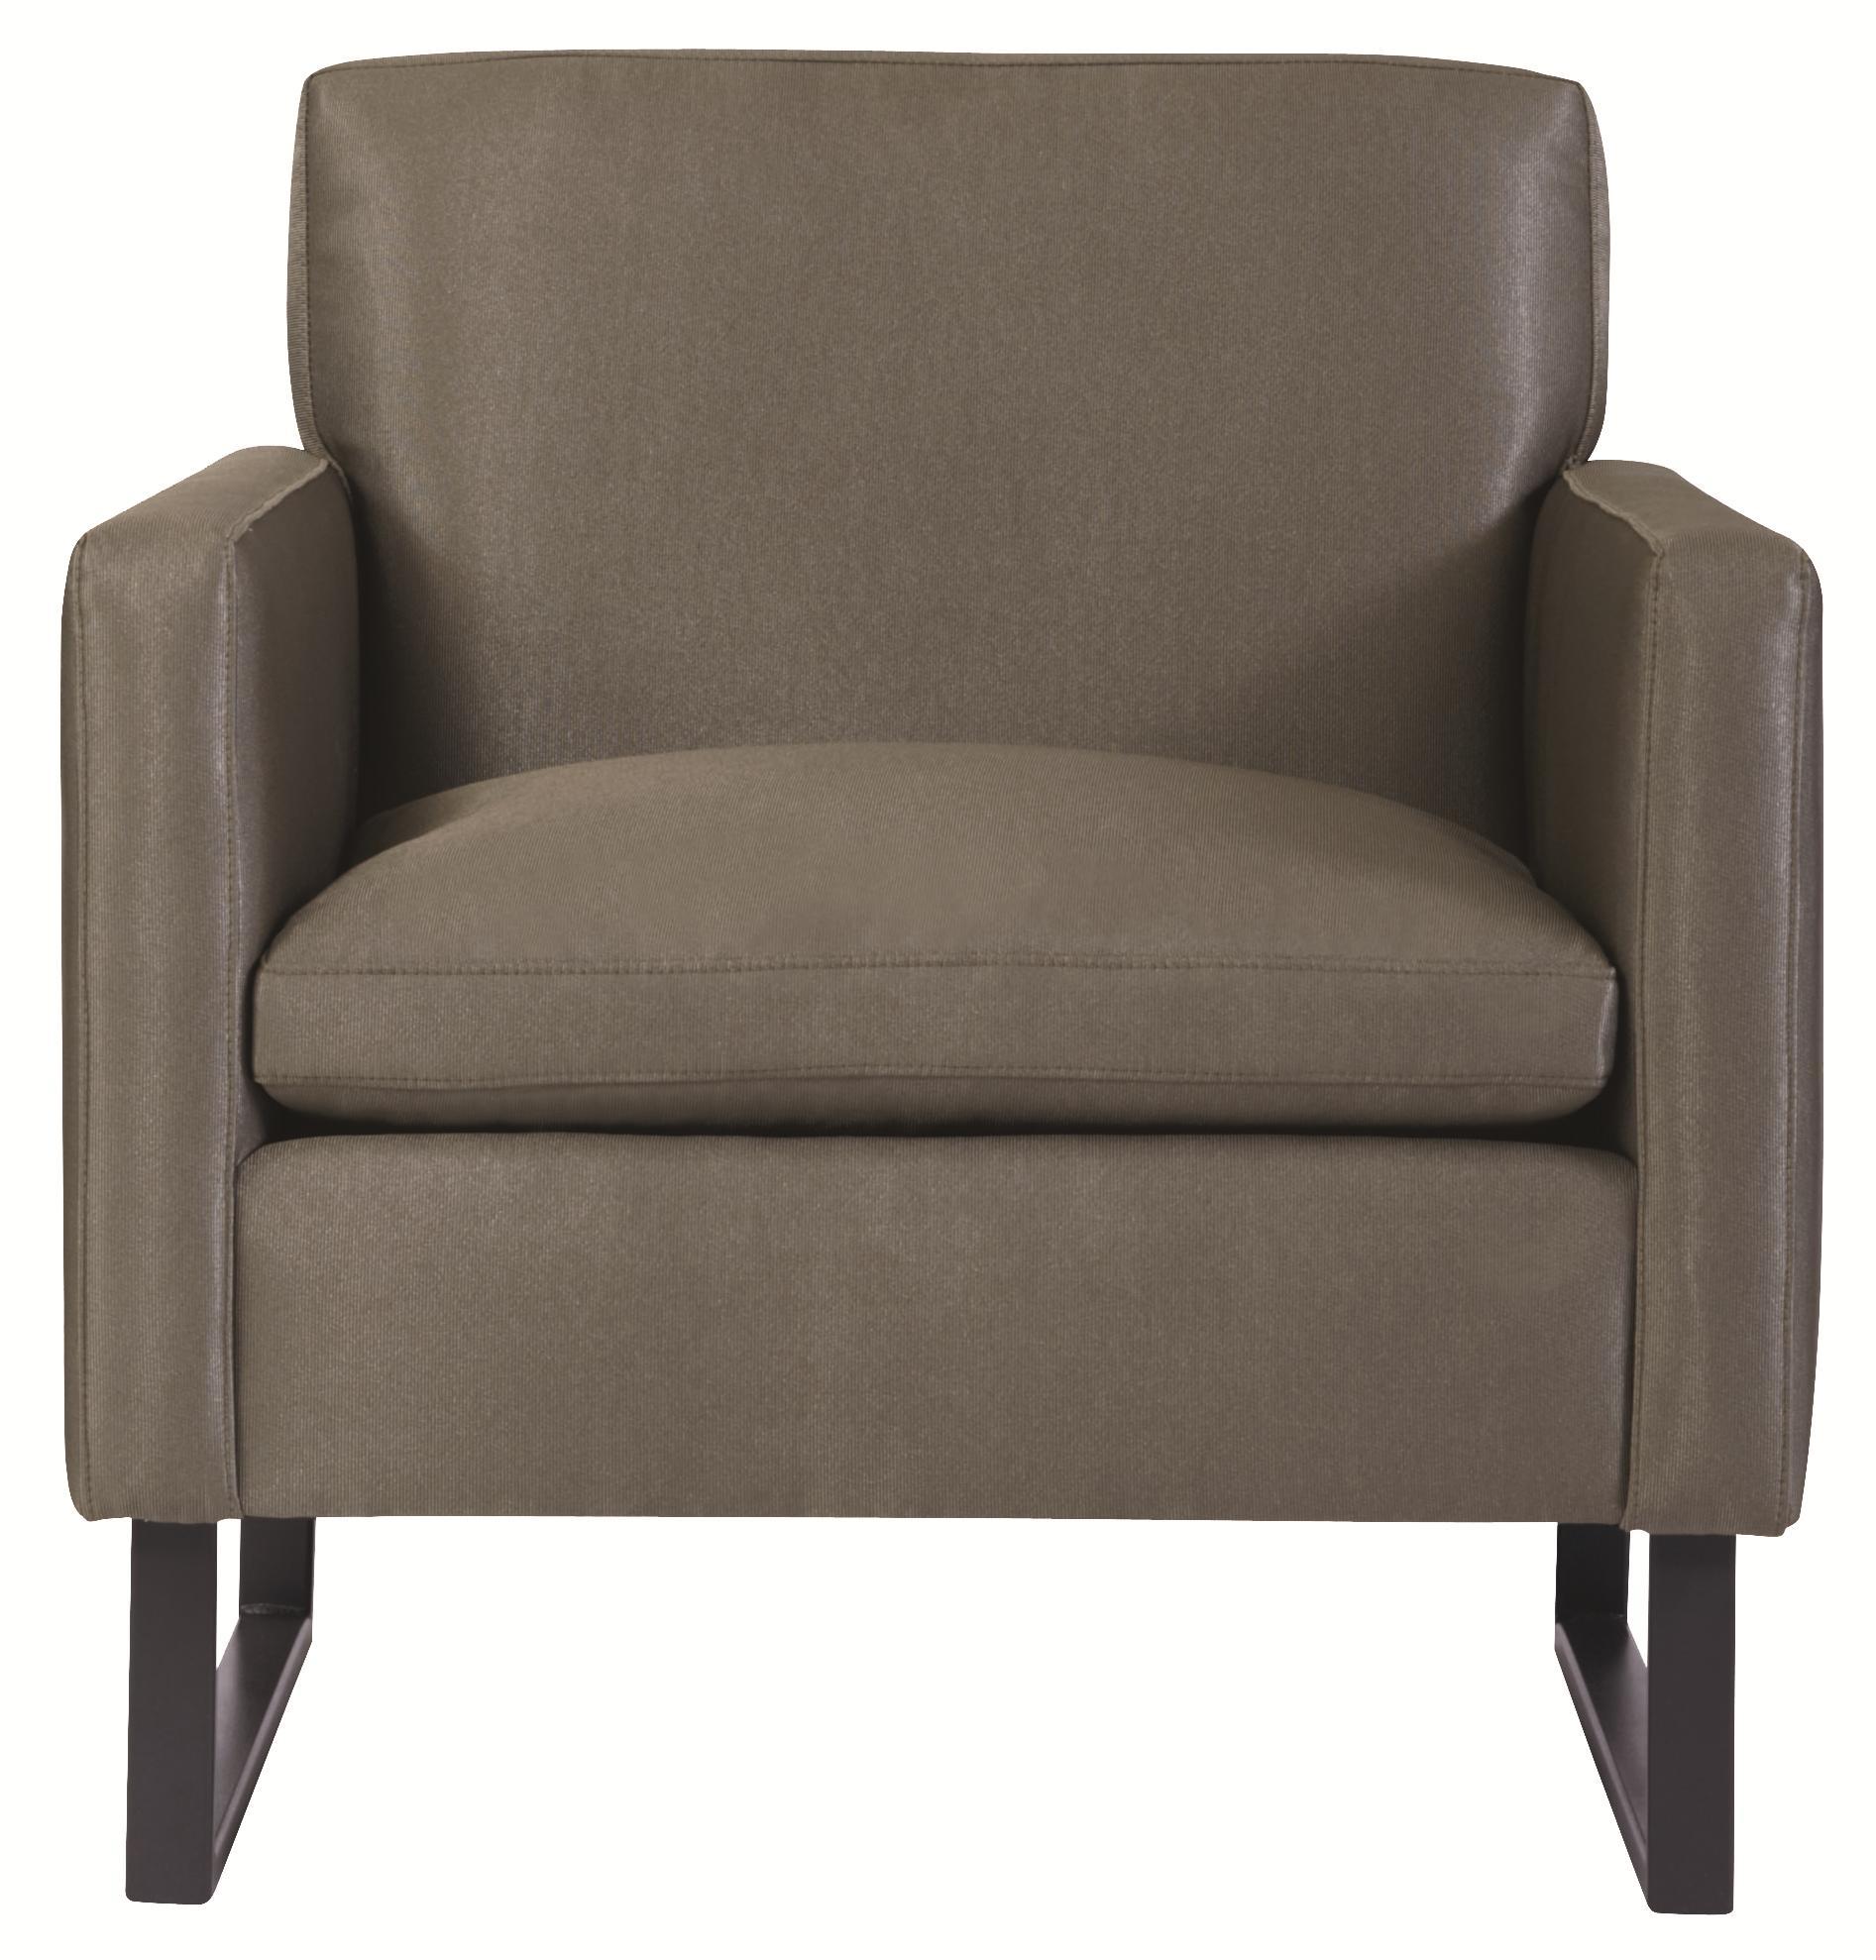 Bernhardt Interiors Jaxon Chair - Item Number: N3522